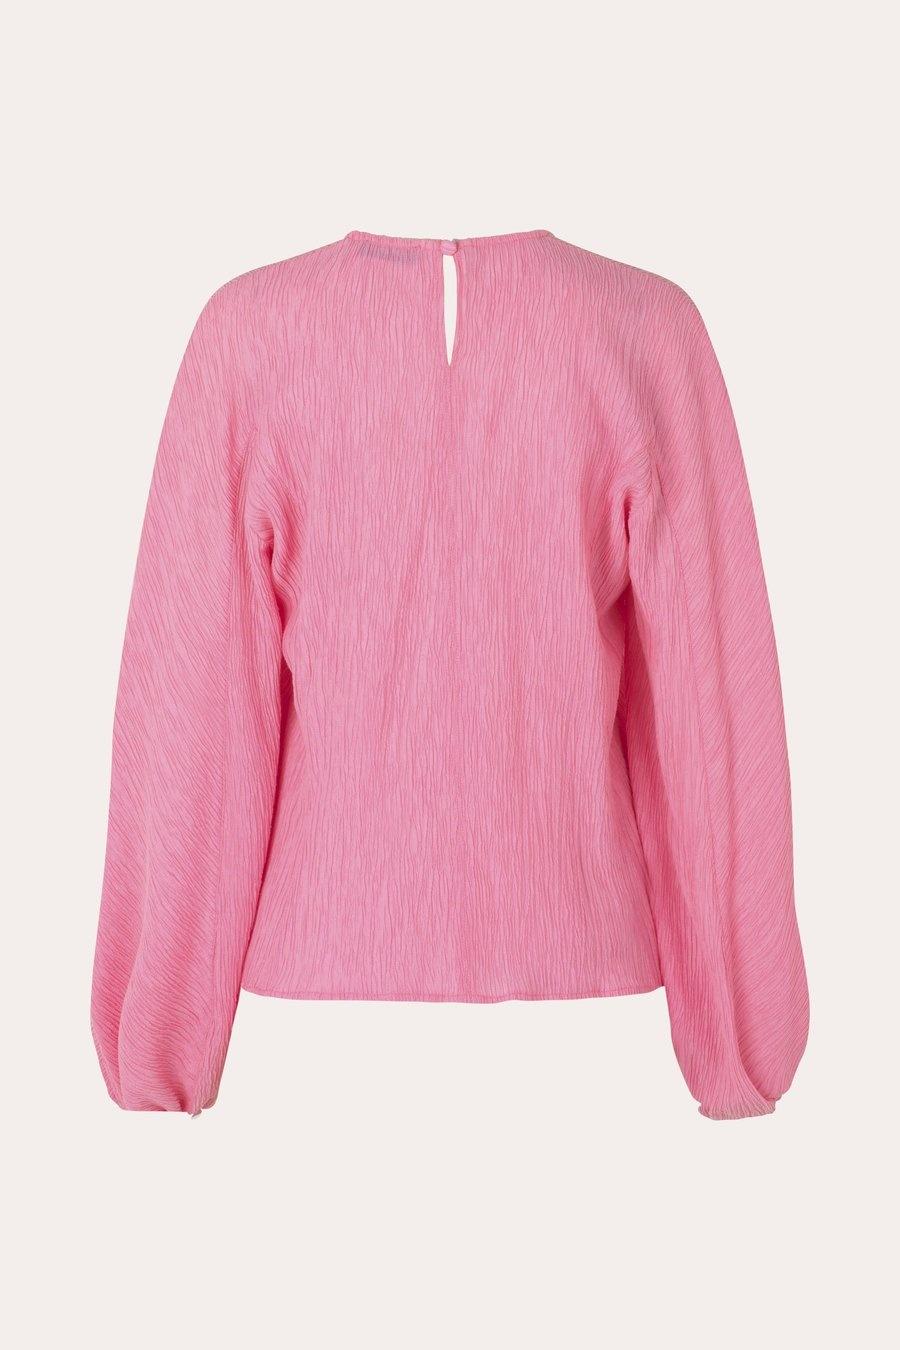 Ida Crinkled Tencel blouse Pink-2